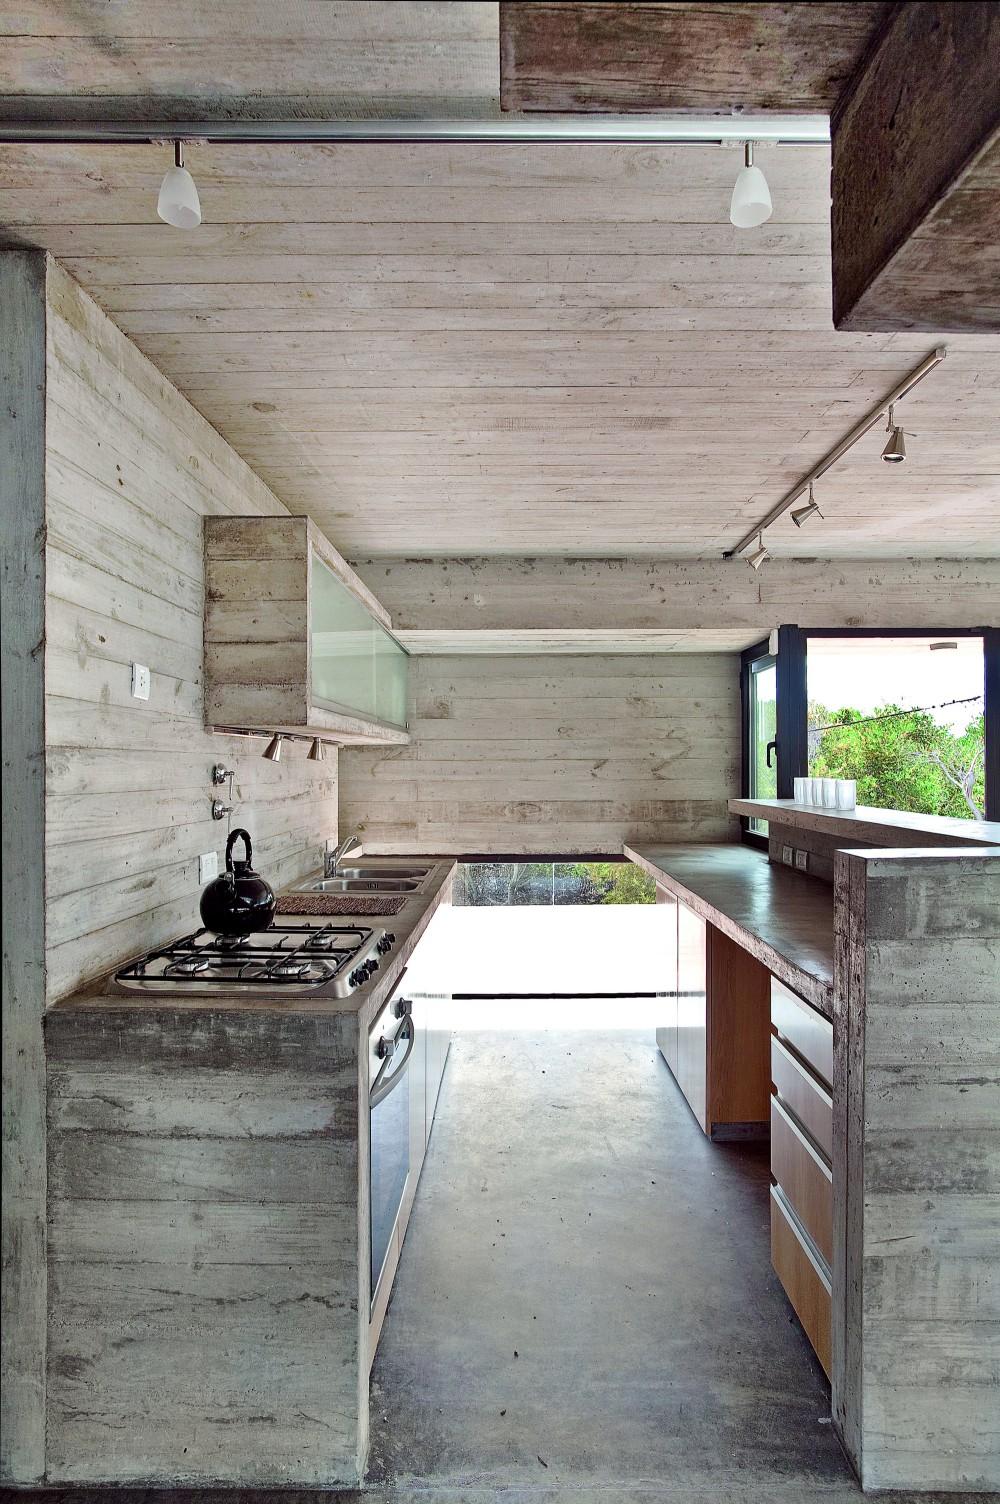 529d3255e8e44e553d000038_casa-en-la-playa-bak-architects_00265330-1000x1504